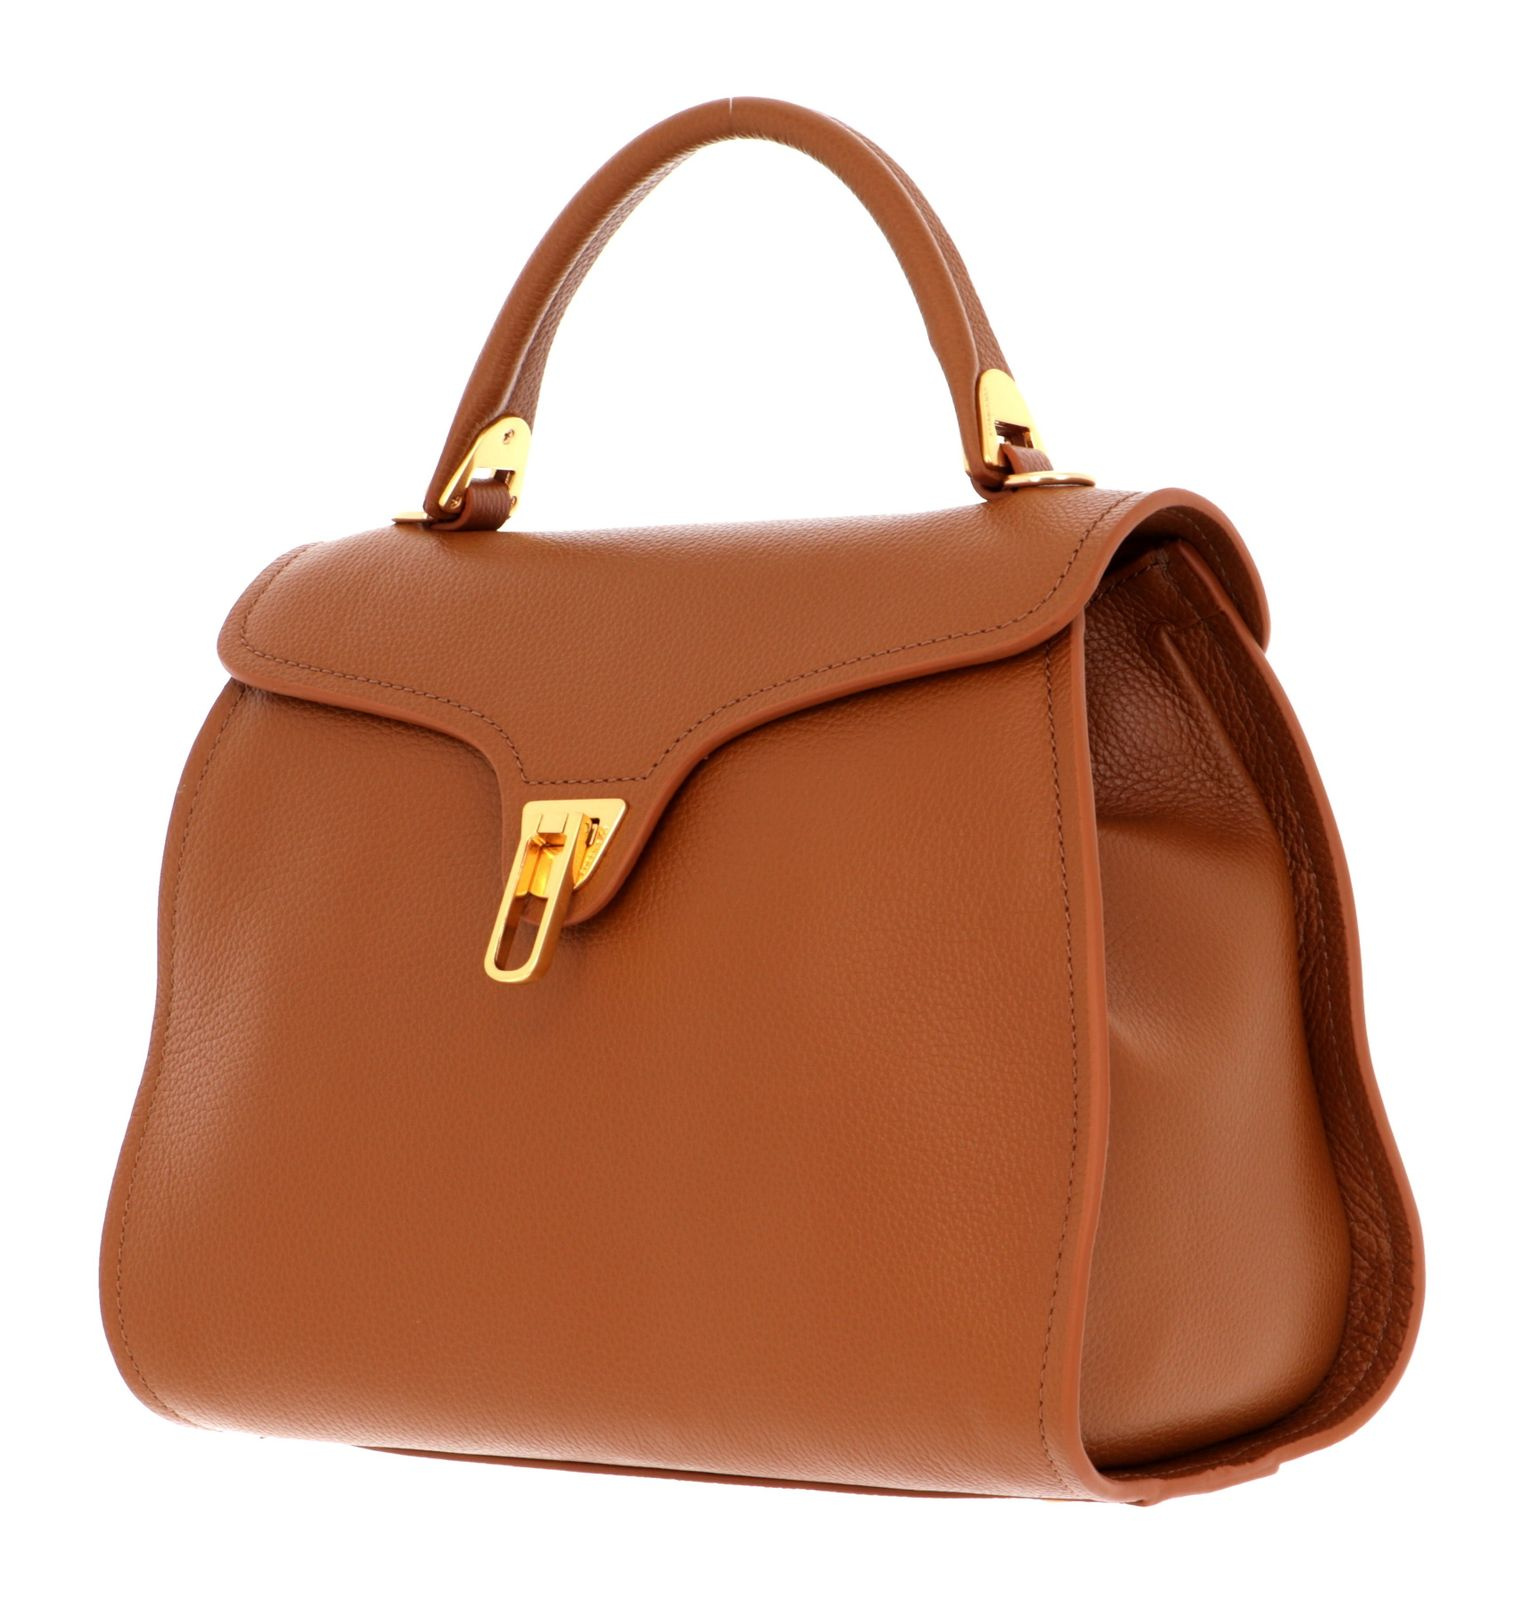 COCCINELLE Marvin Small Handbag Caramel